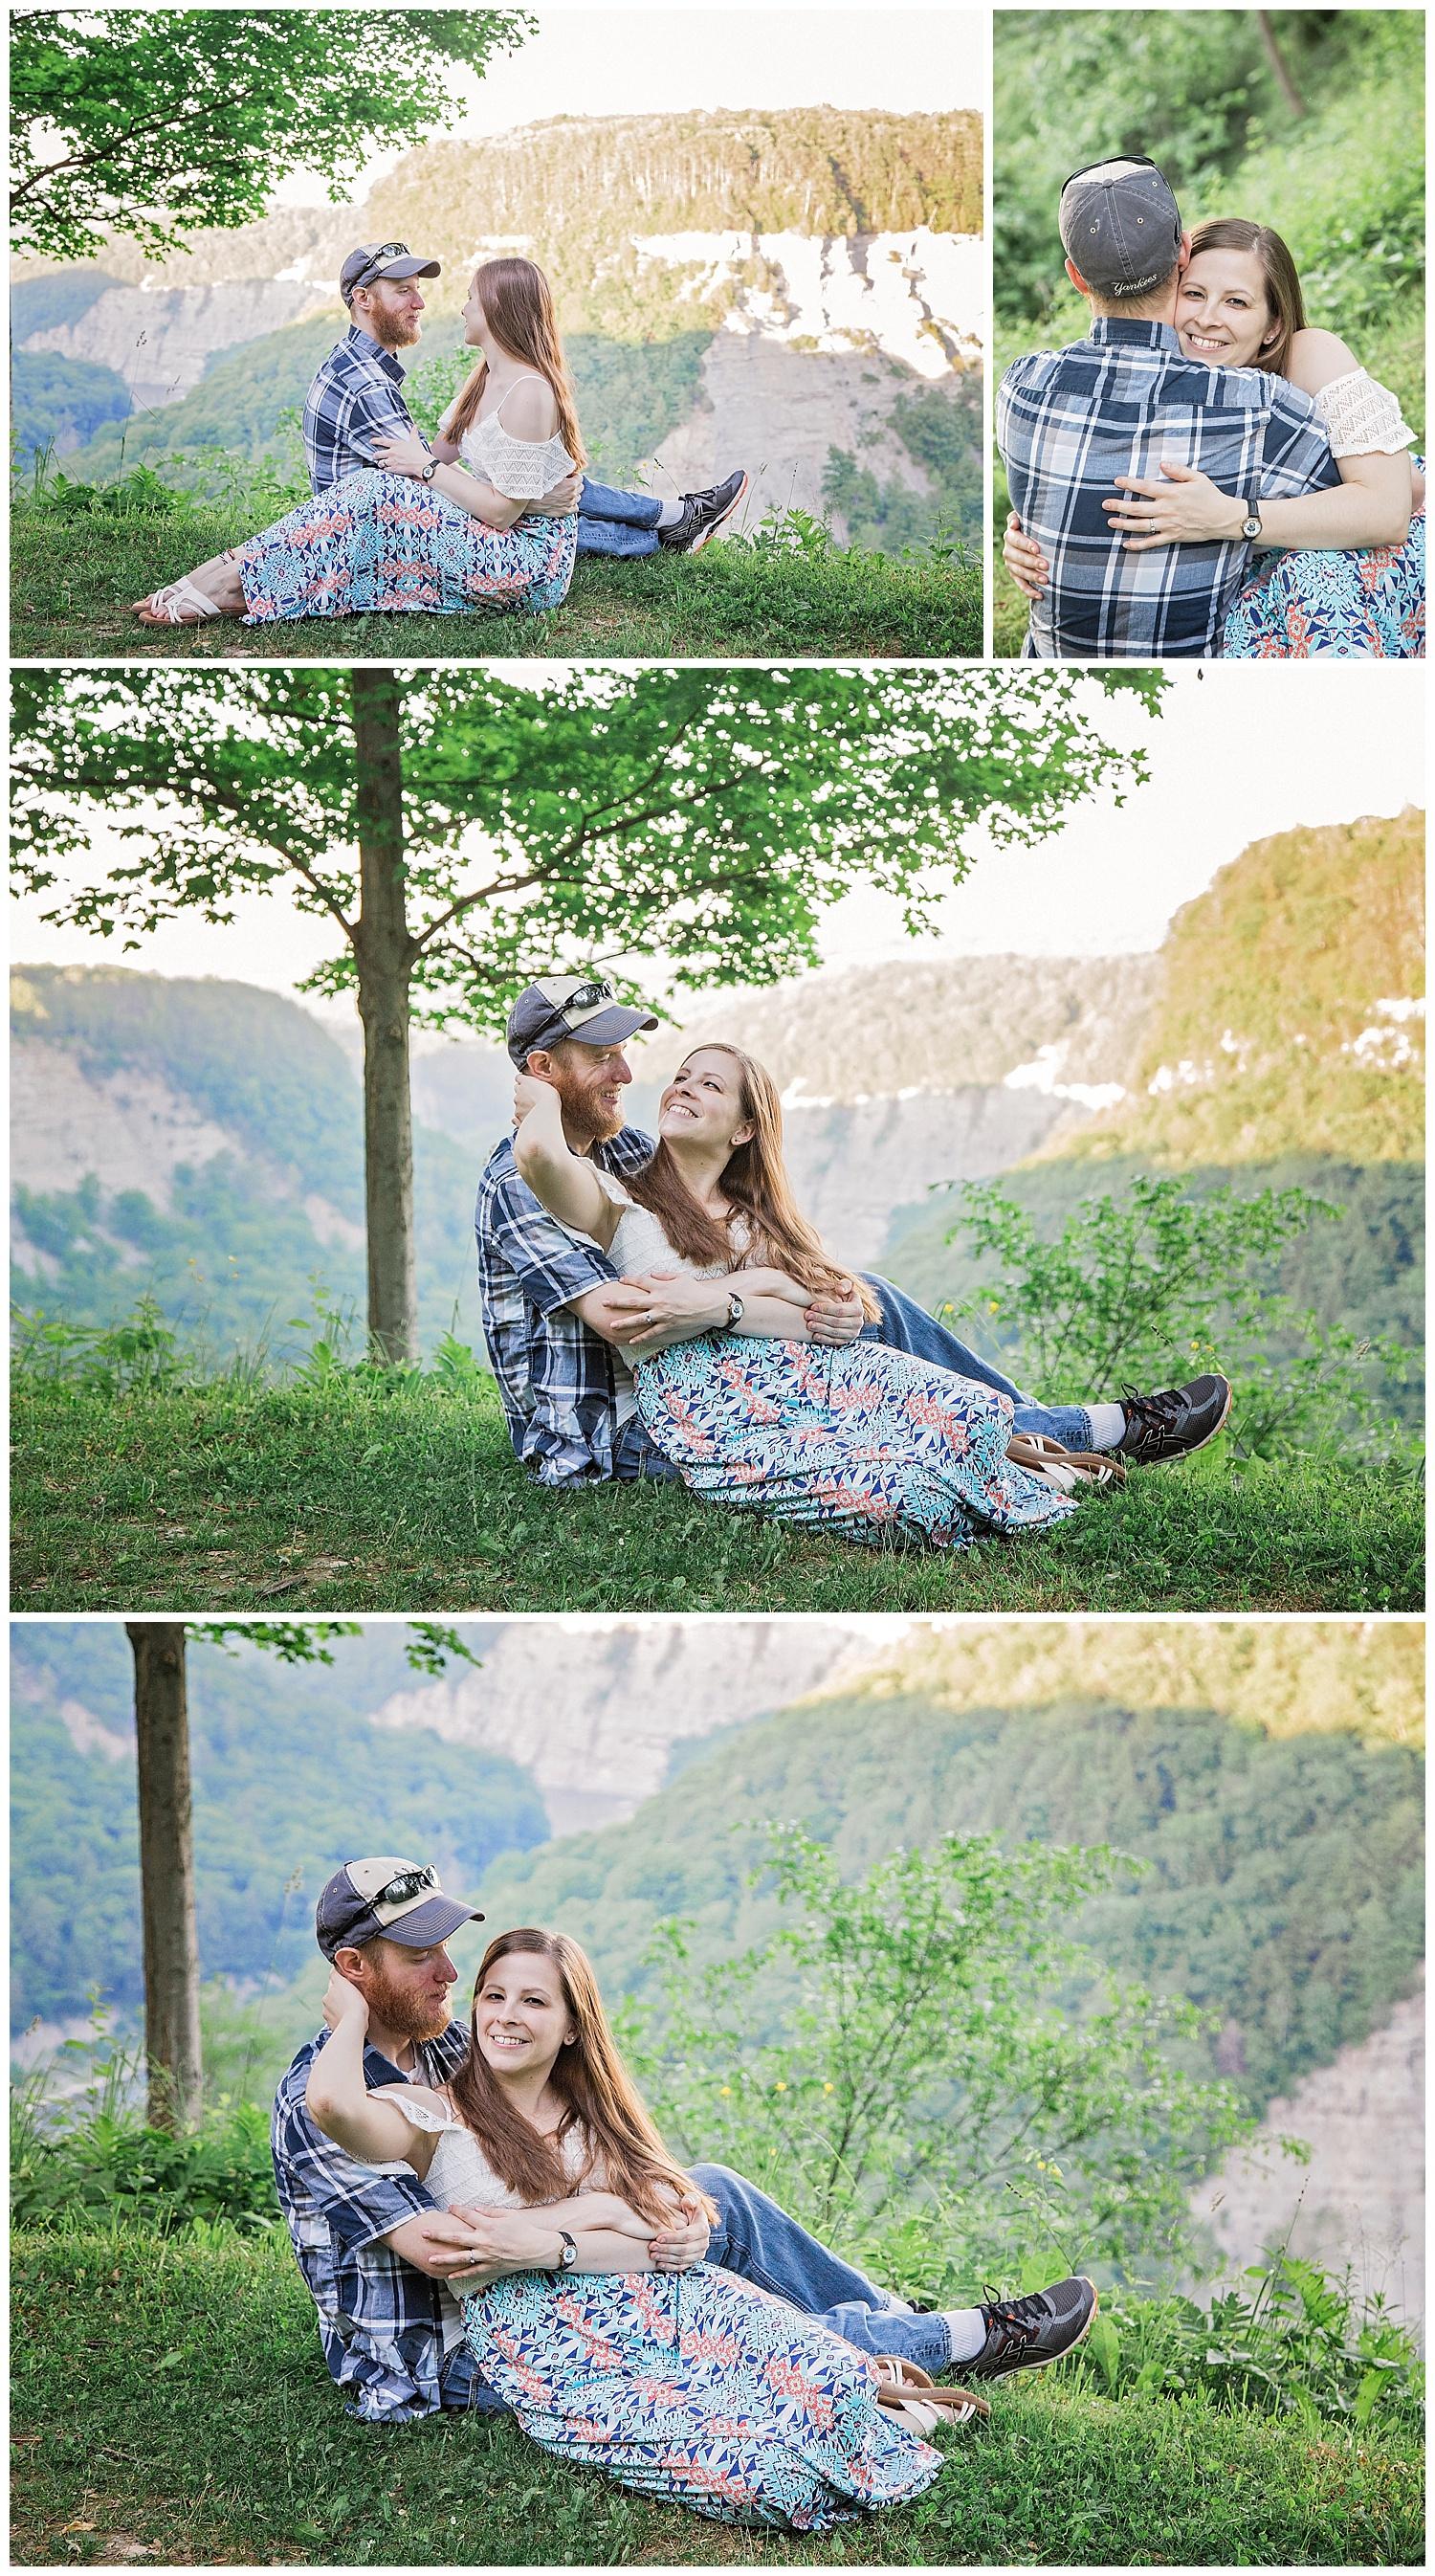 M & B - Letchworth state park - Lass & Beau-194_Buffalo wedding photography.jpg